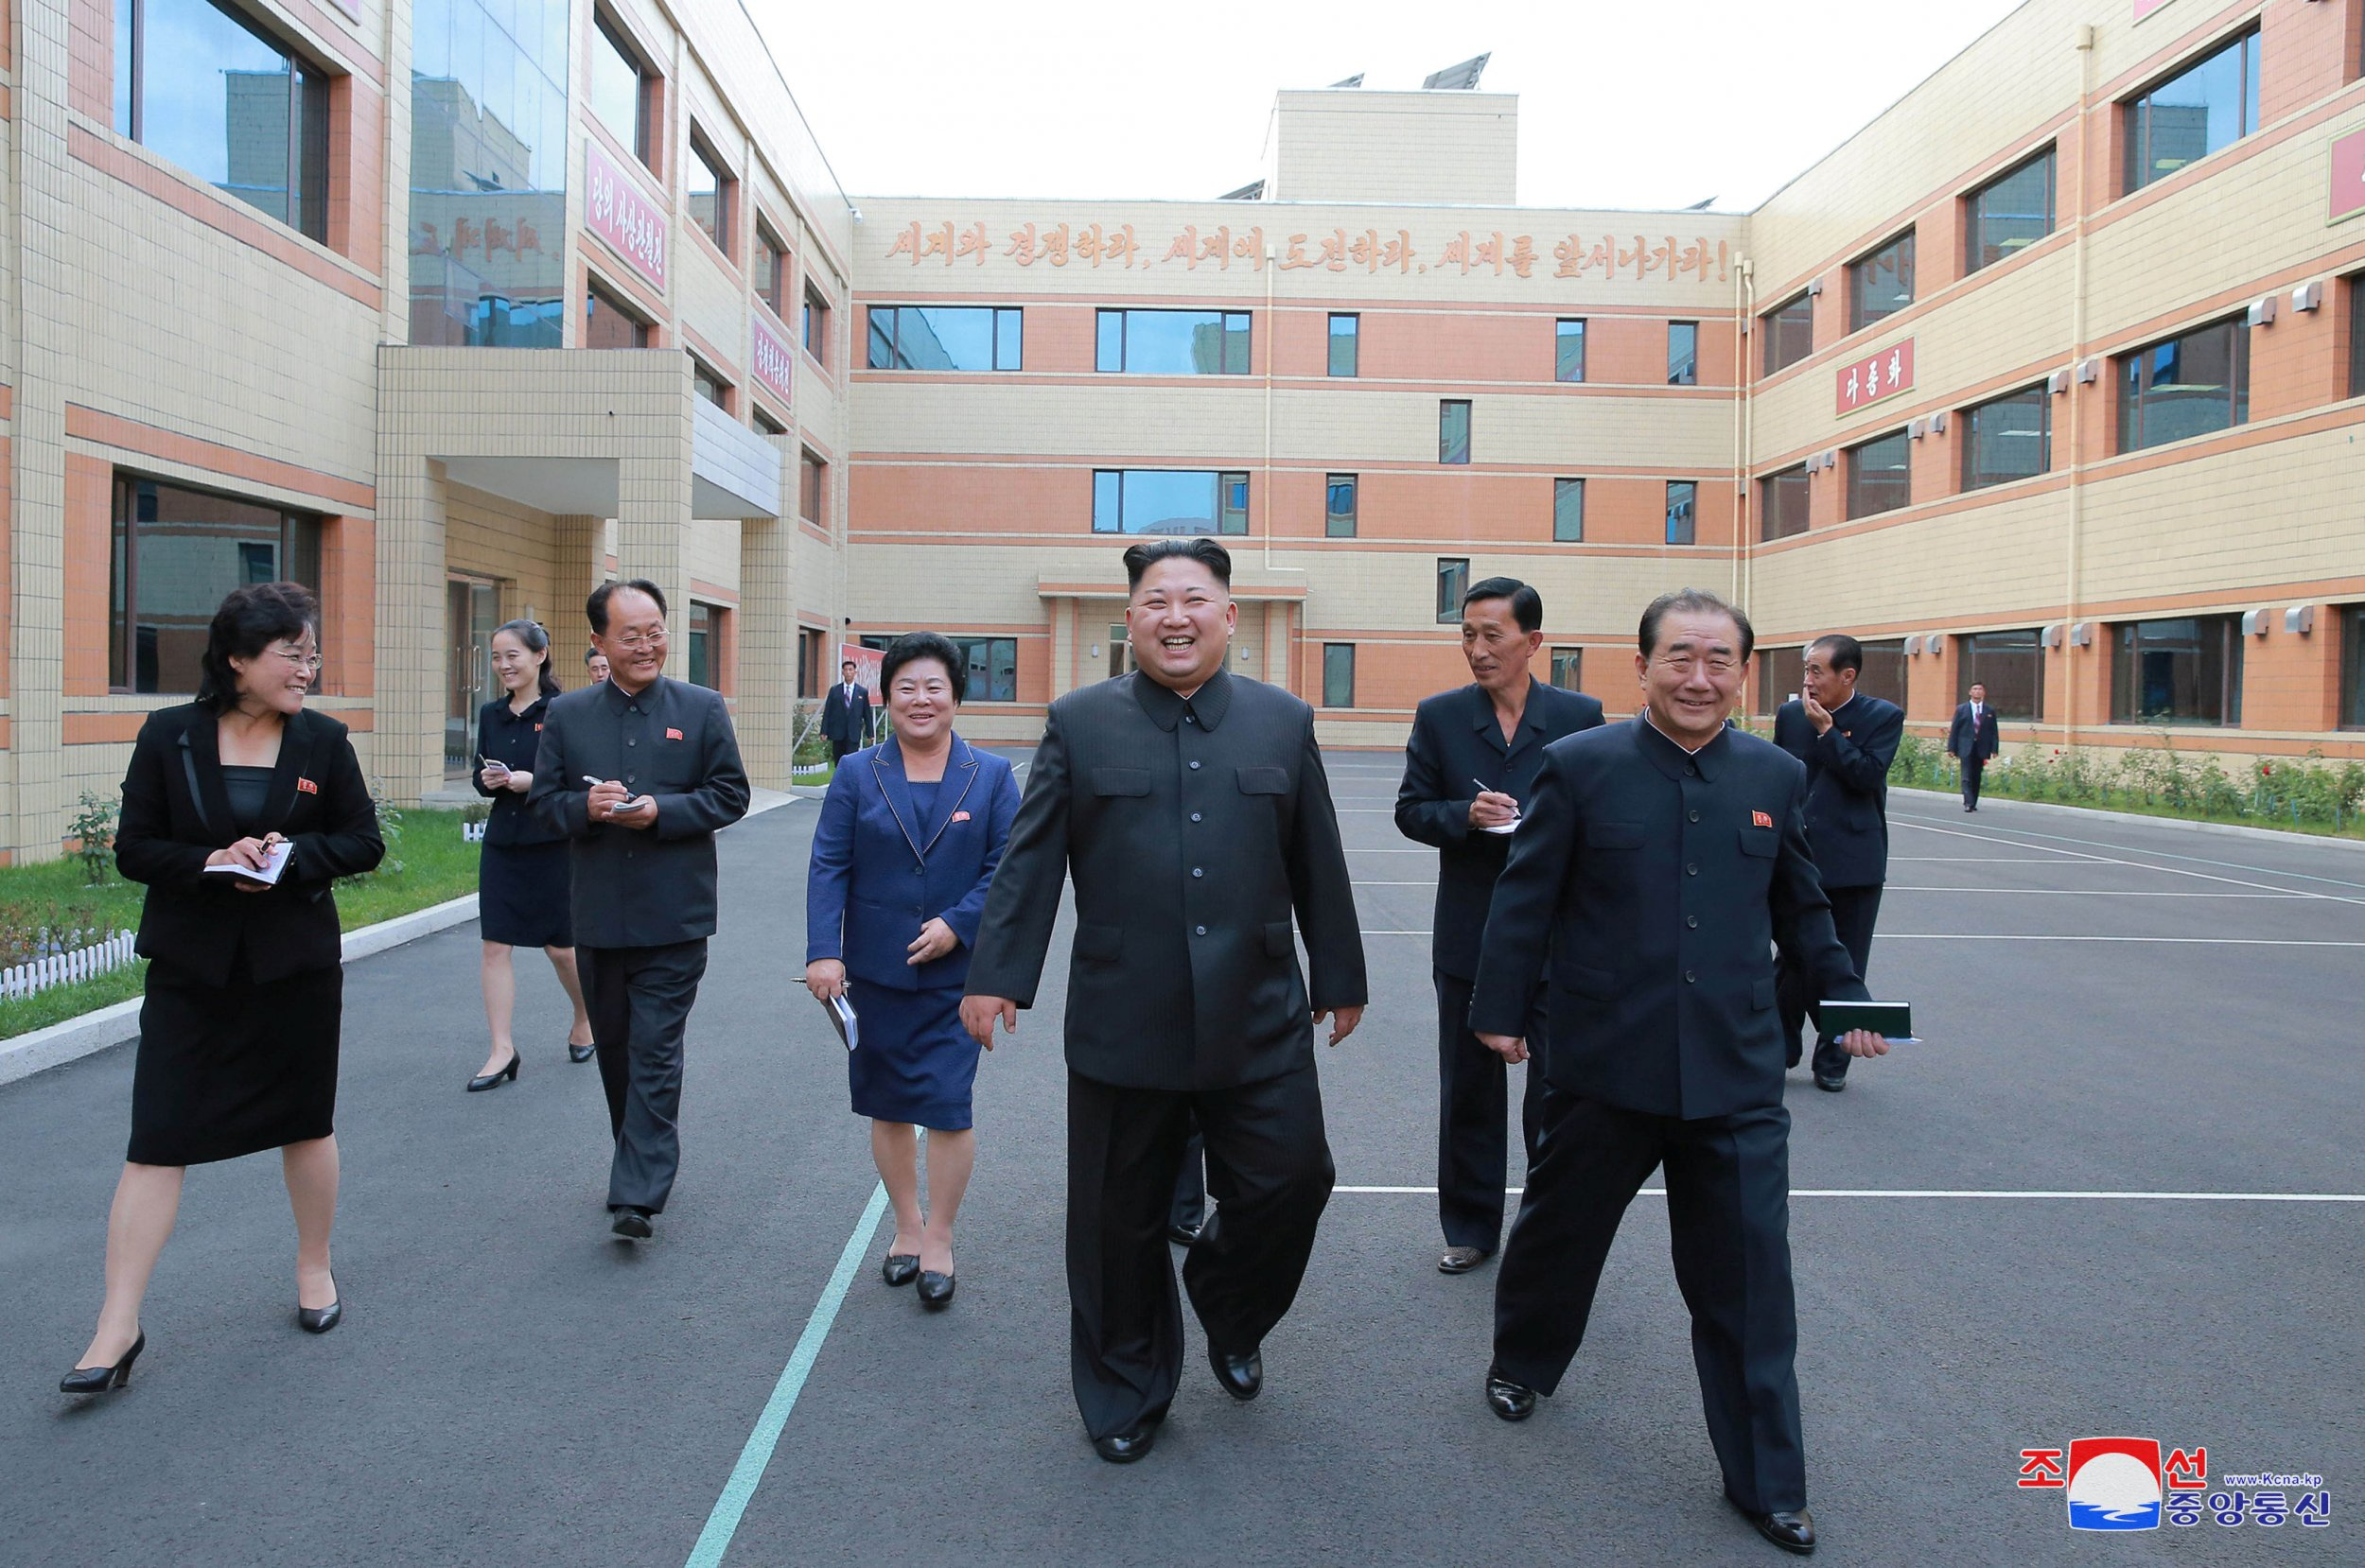 Watch North Koreas Kim Jong Un Visits Trump Tower And Nyc Landmarks